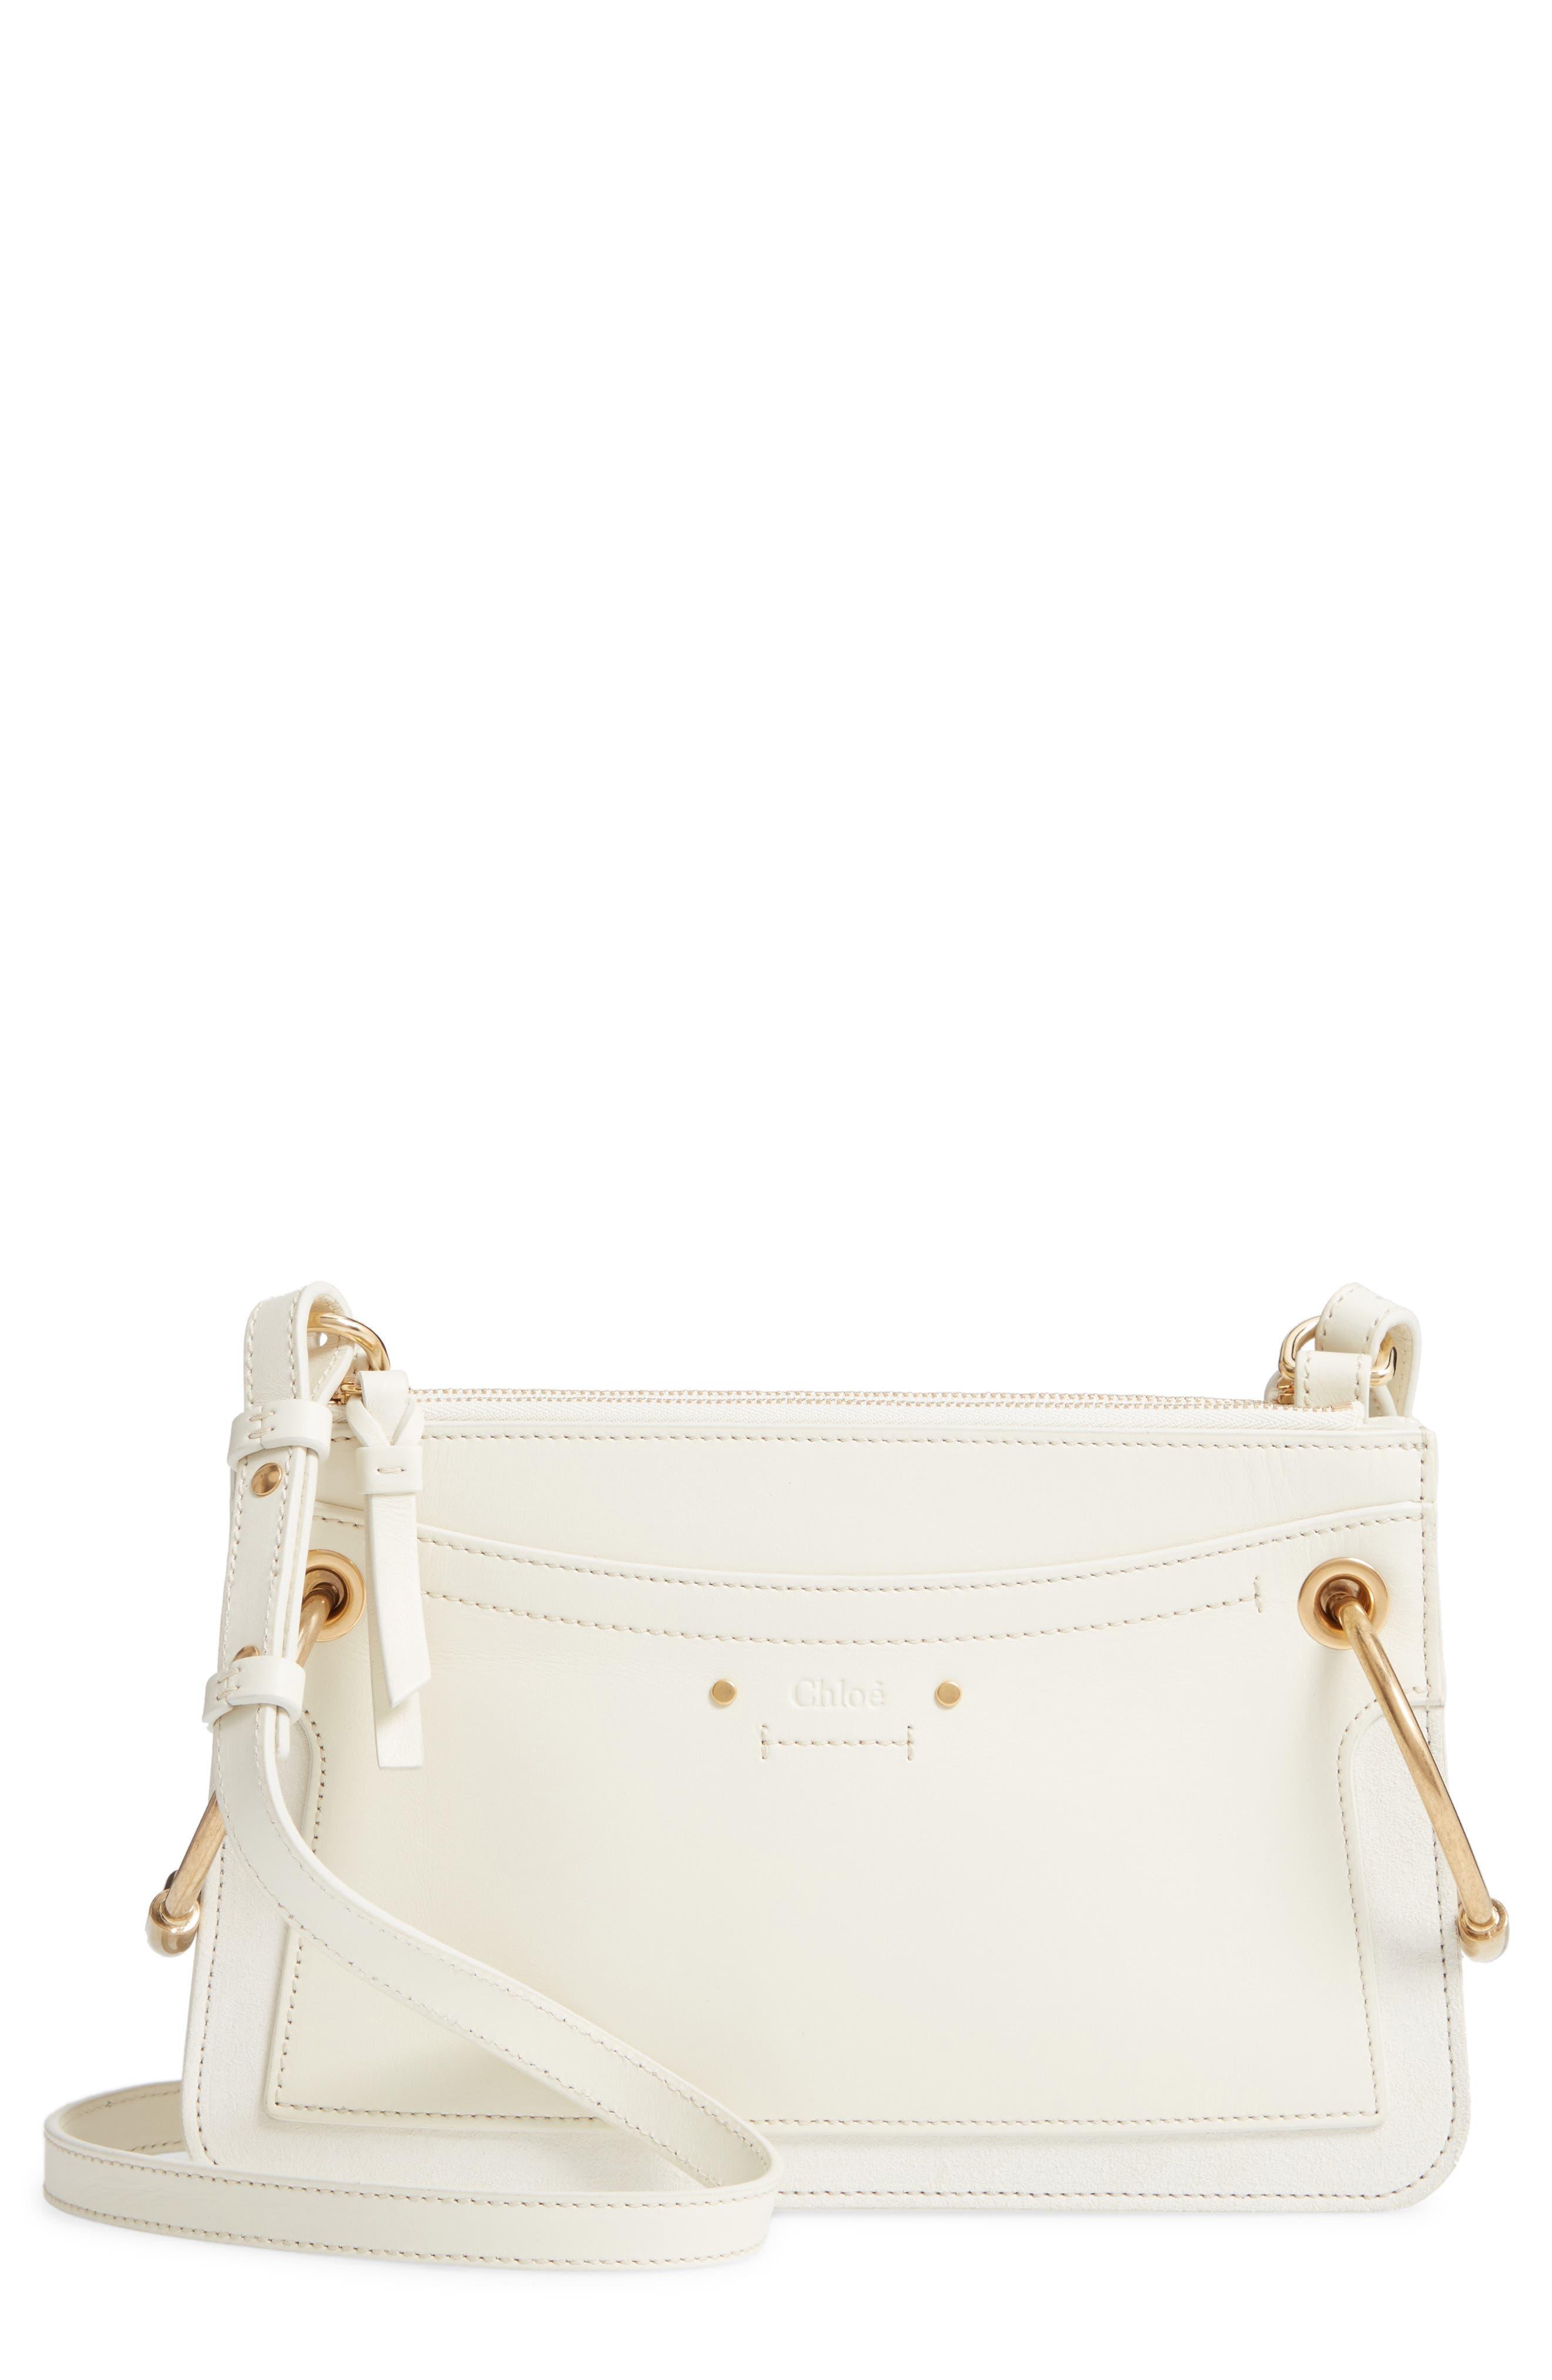 CHLOÉ,                             Small Roy Leather Shoulder Bag,                             Main thumbnail 1, color,                             NATURAL WHITE